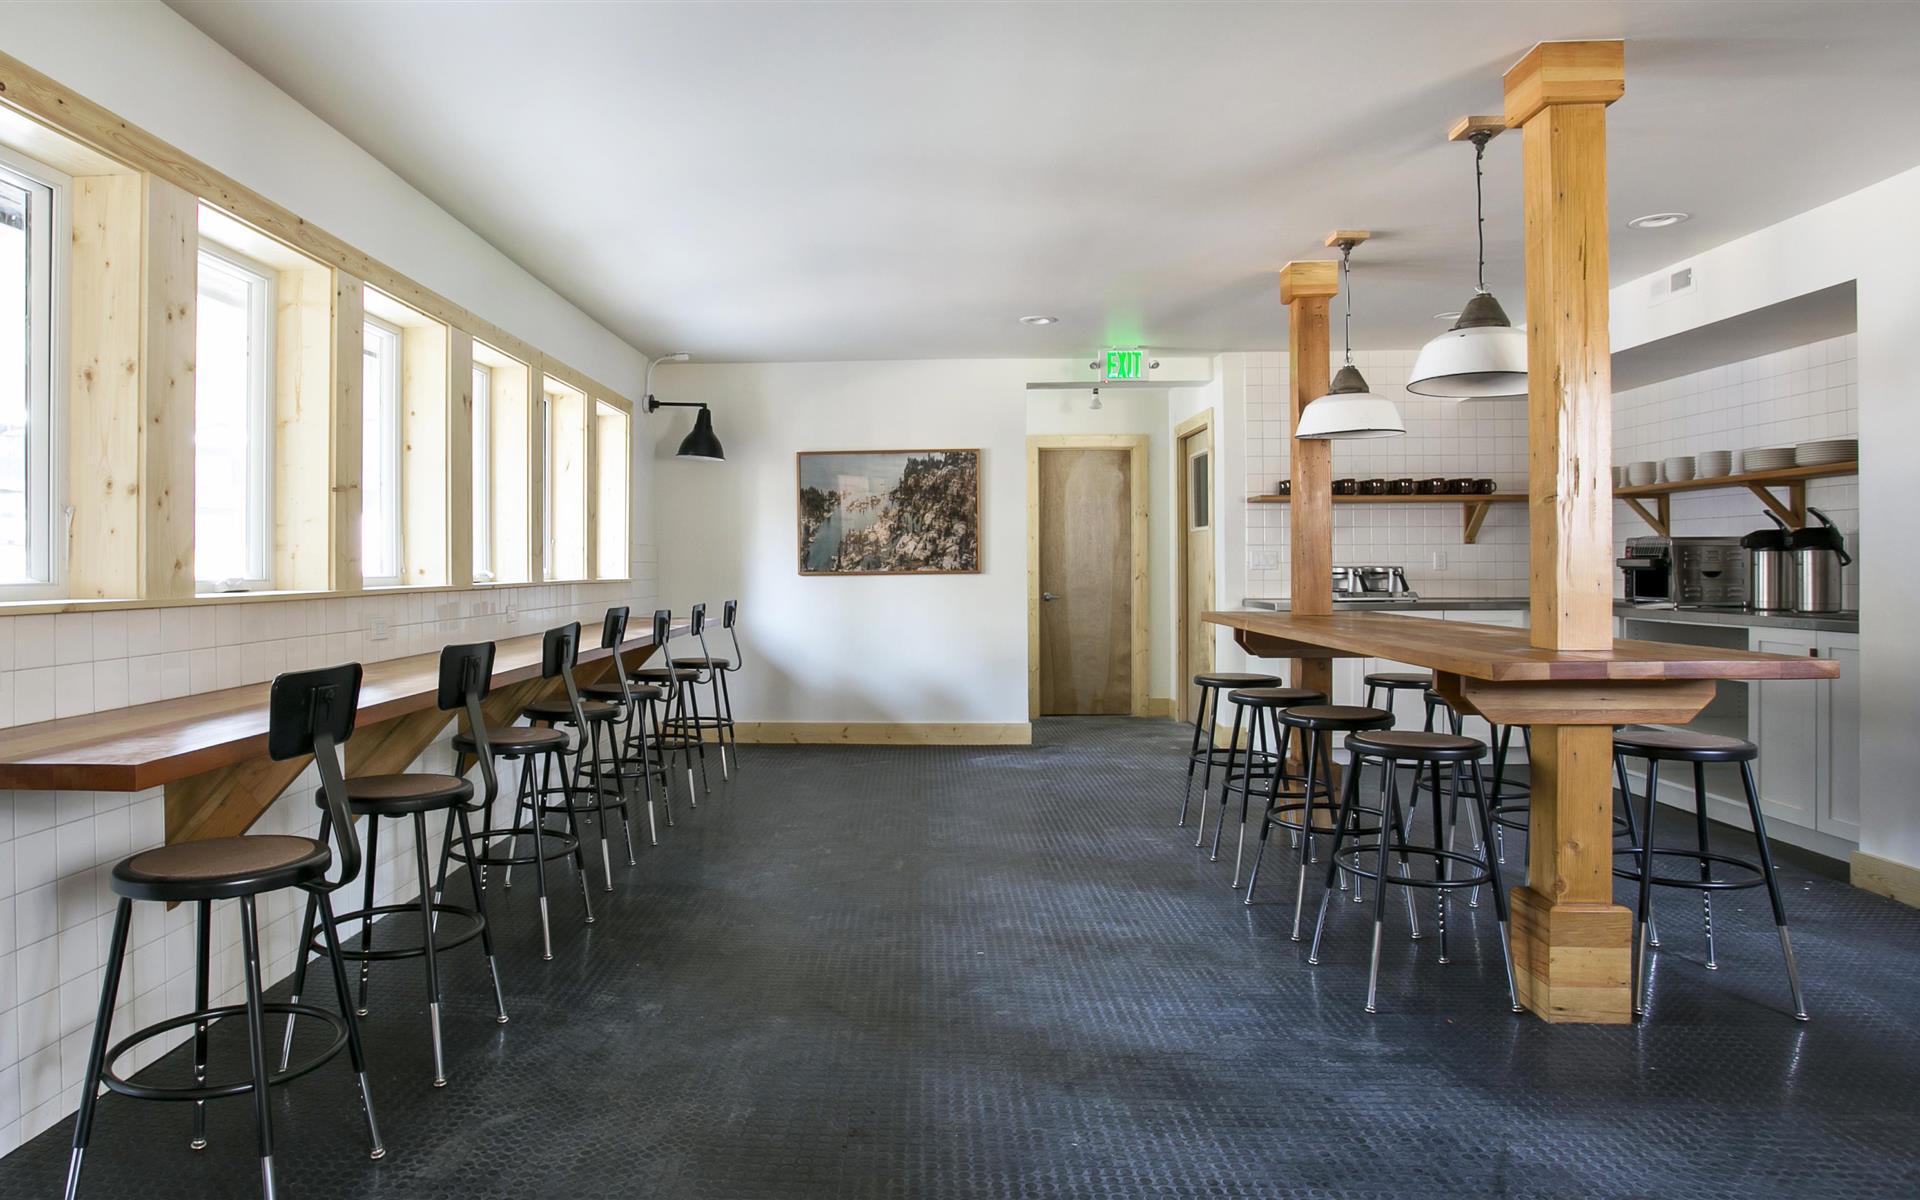 Coachman Hotel - Community Room